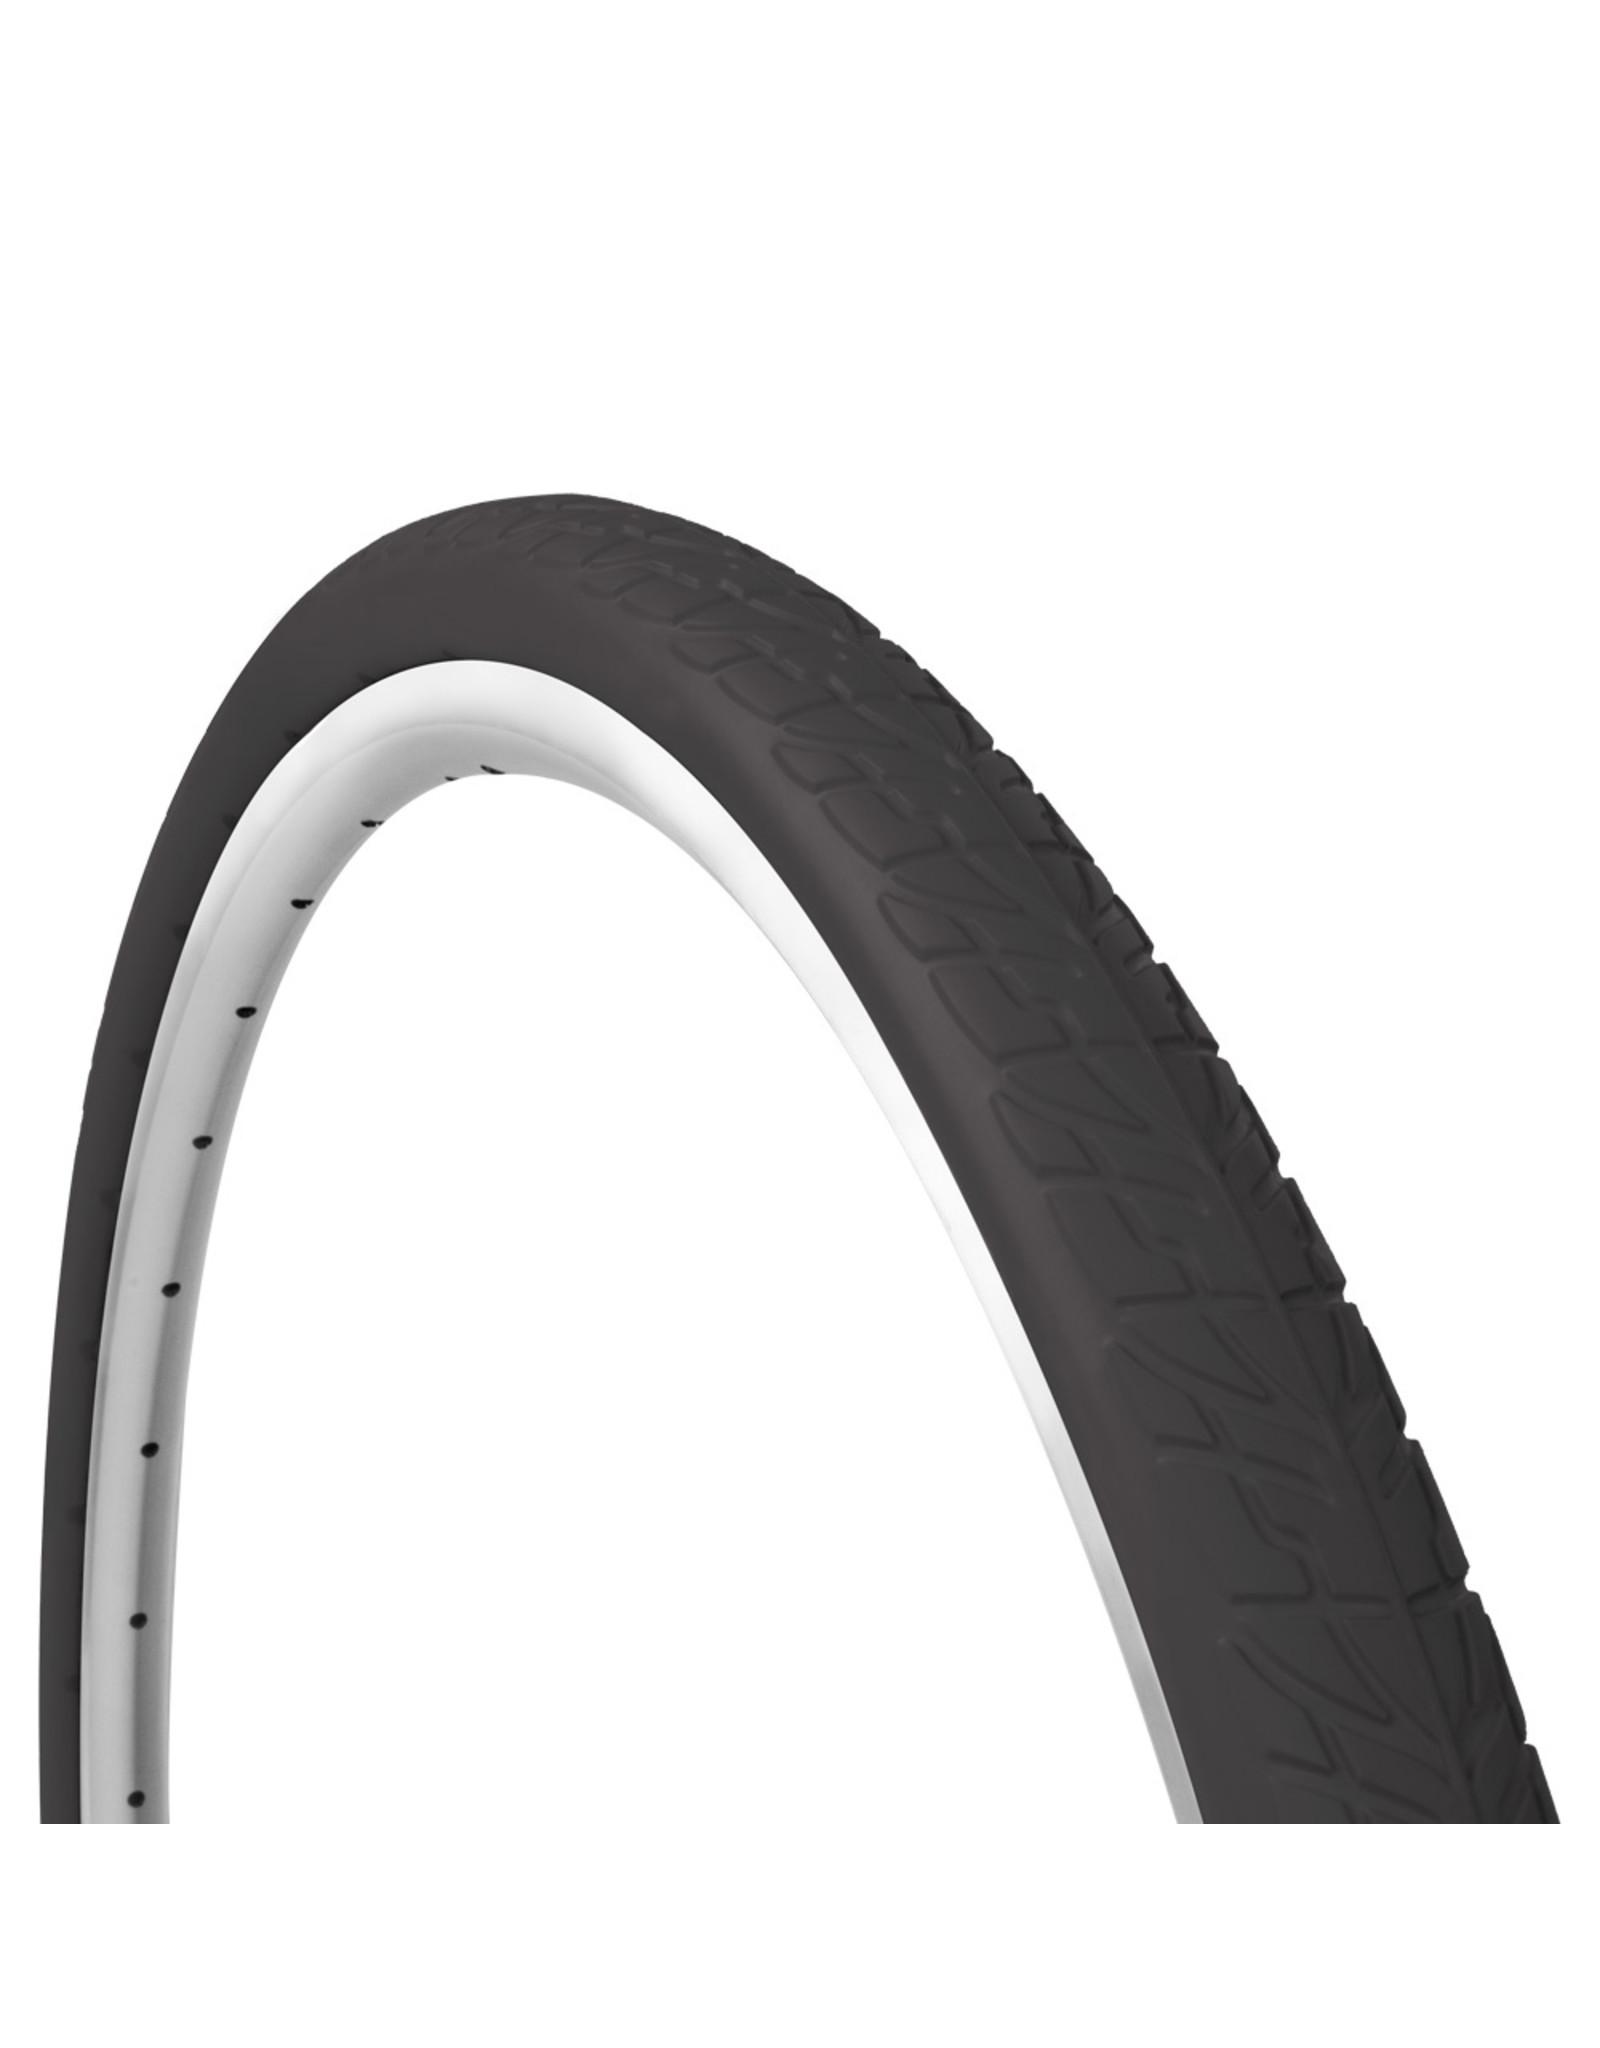 Tannus Tannus Shield 700x32 Airless Tire, Black - Single